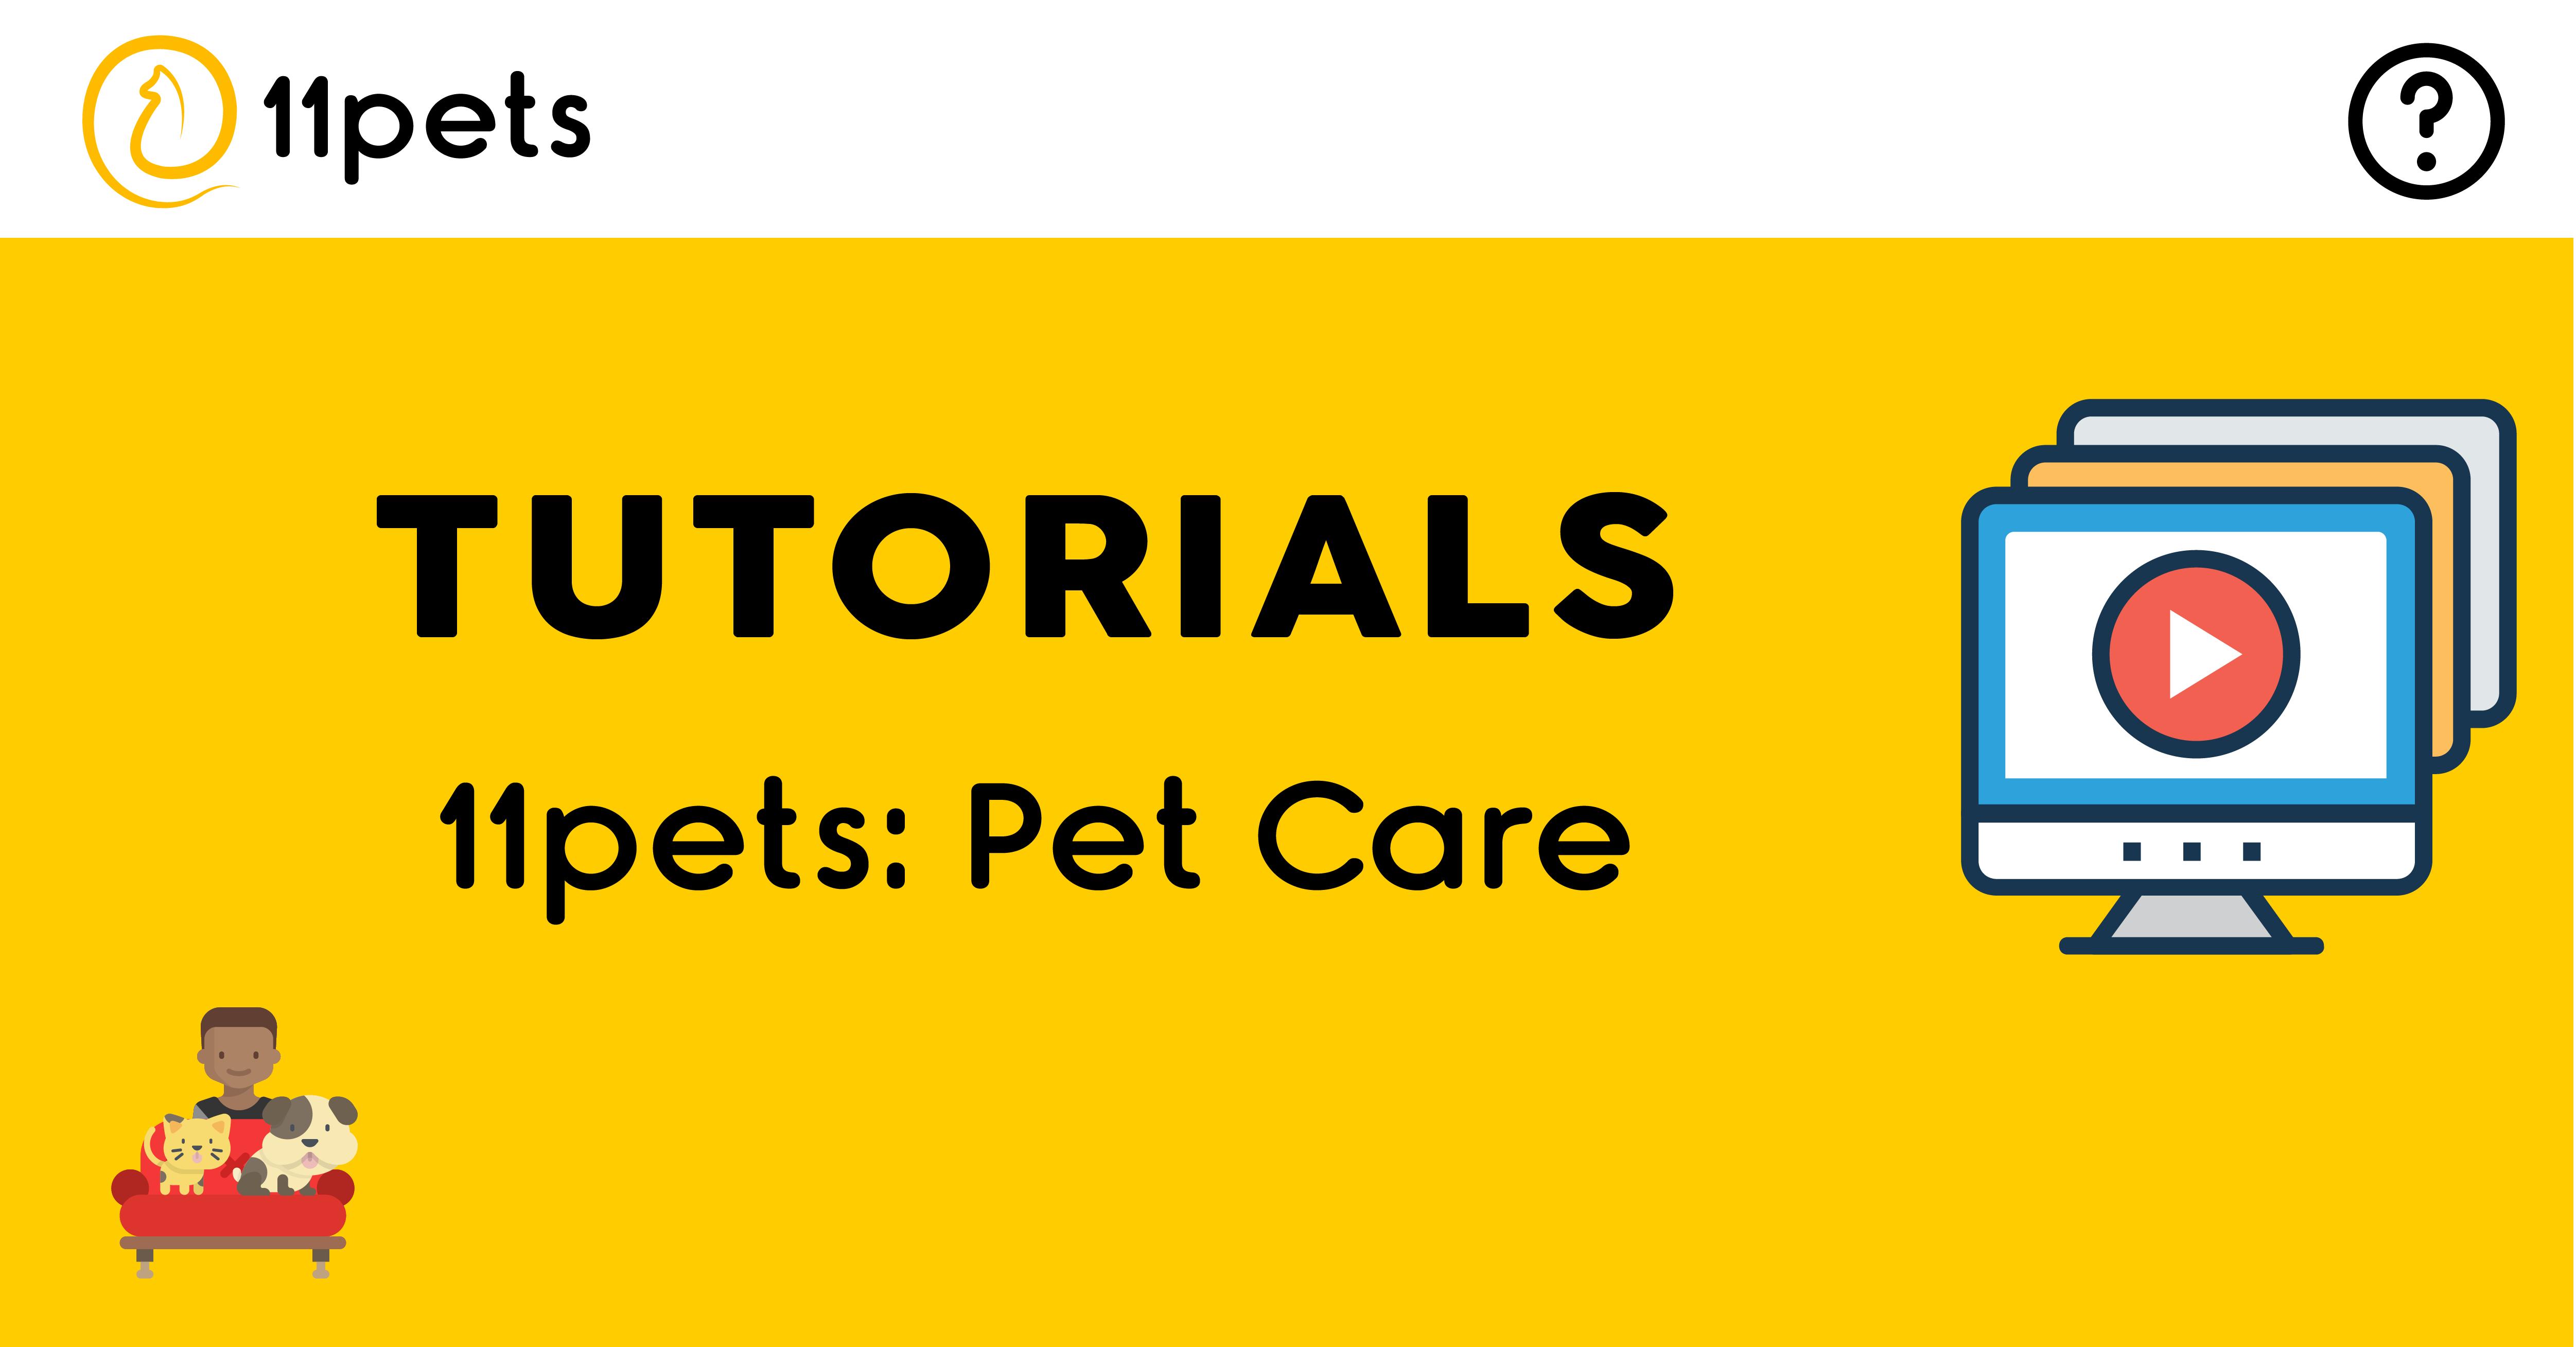 Tutorials for the platform 11pets: Pet Care